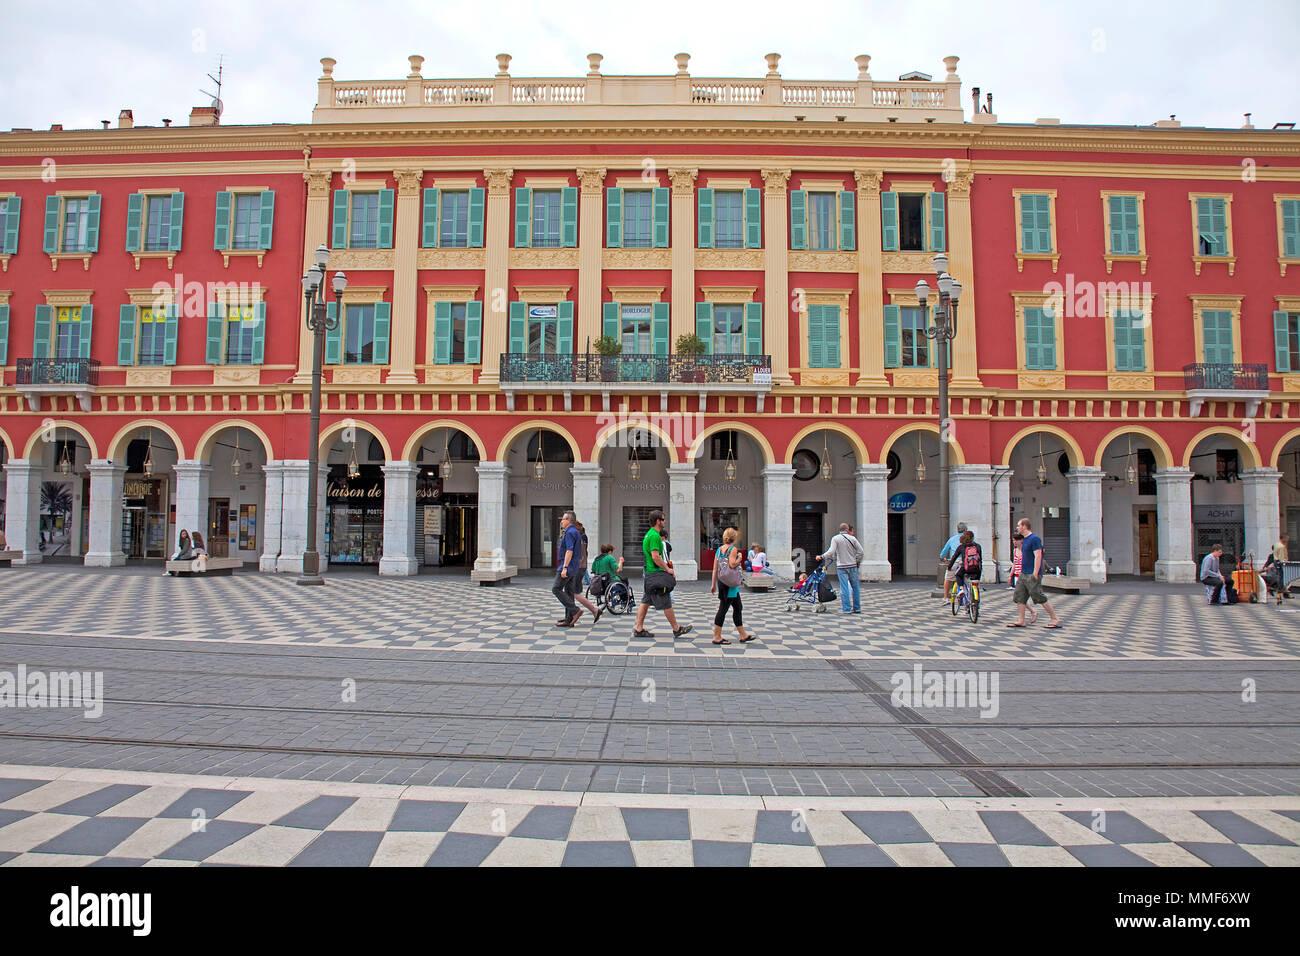 Shopping center Lafayette, Place Masséna, Nice, Côte d'Azur, Alpes-Maritimes, South France, France, Europe - Stock Image